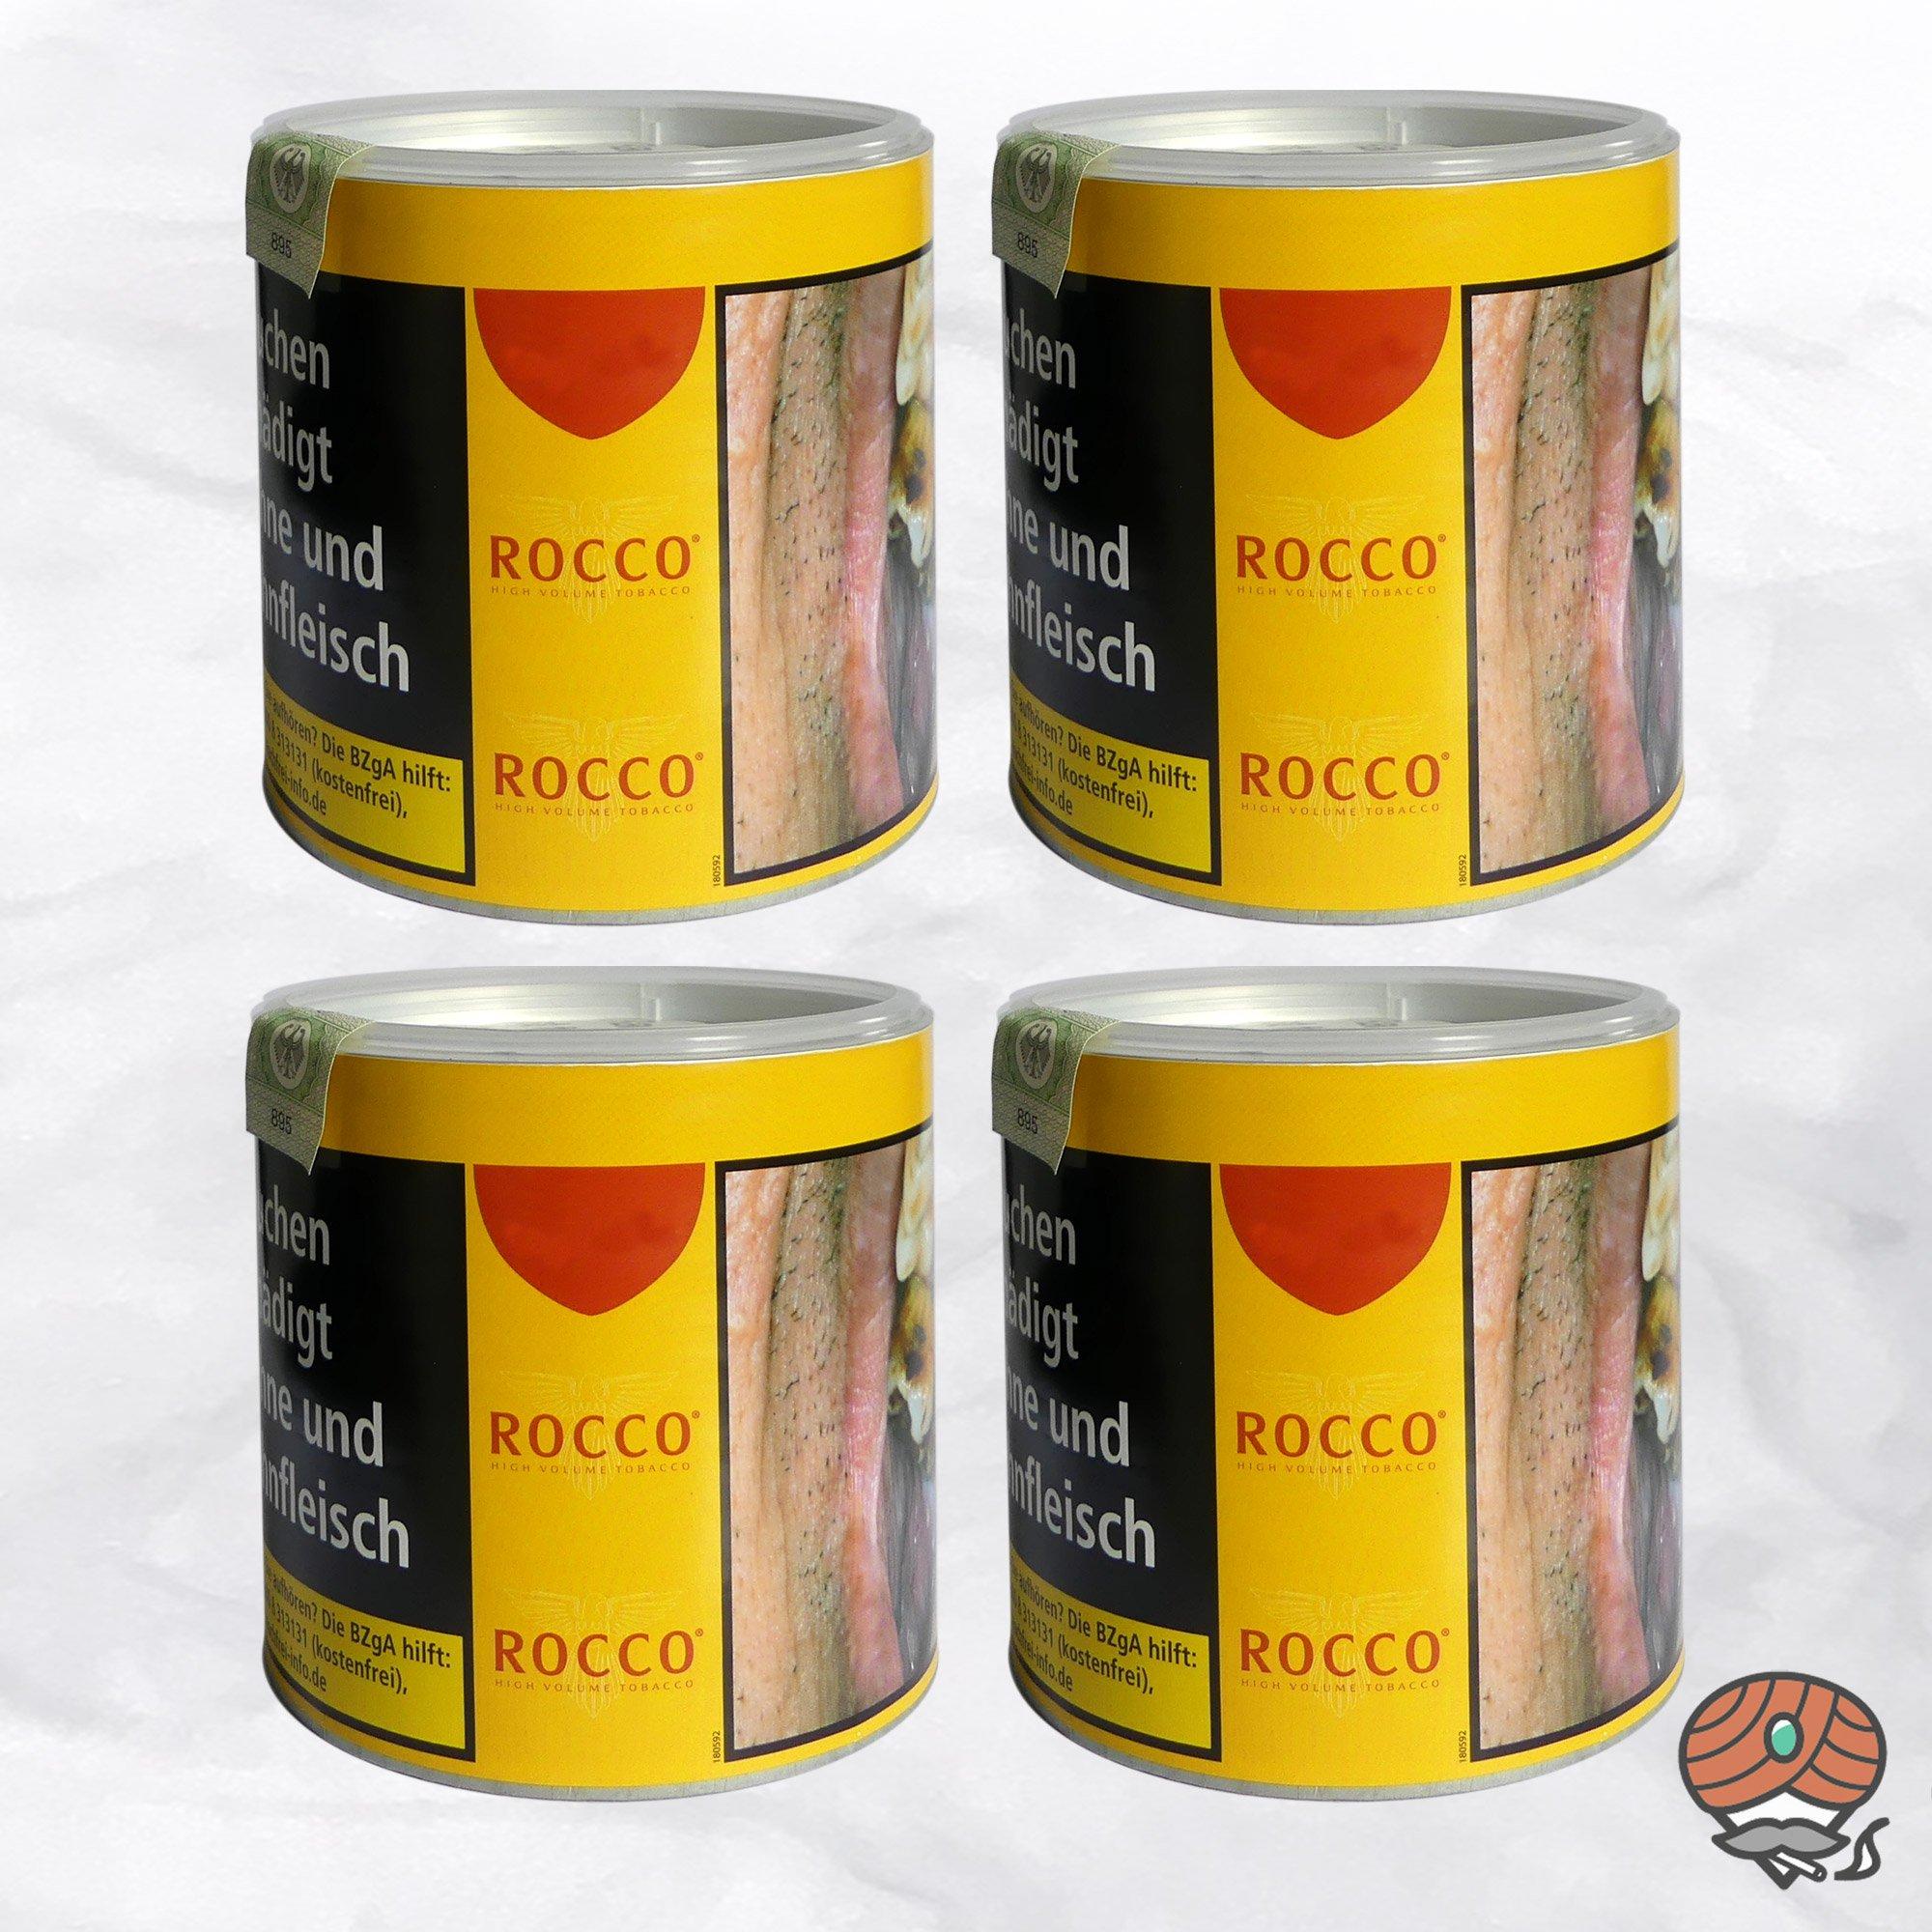 4 x ROCCO Tabak / Volumentabak Gelb Dose 35 g